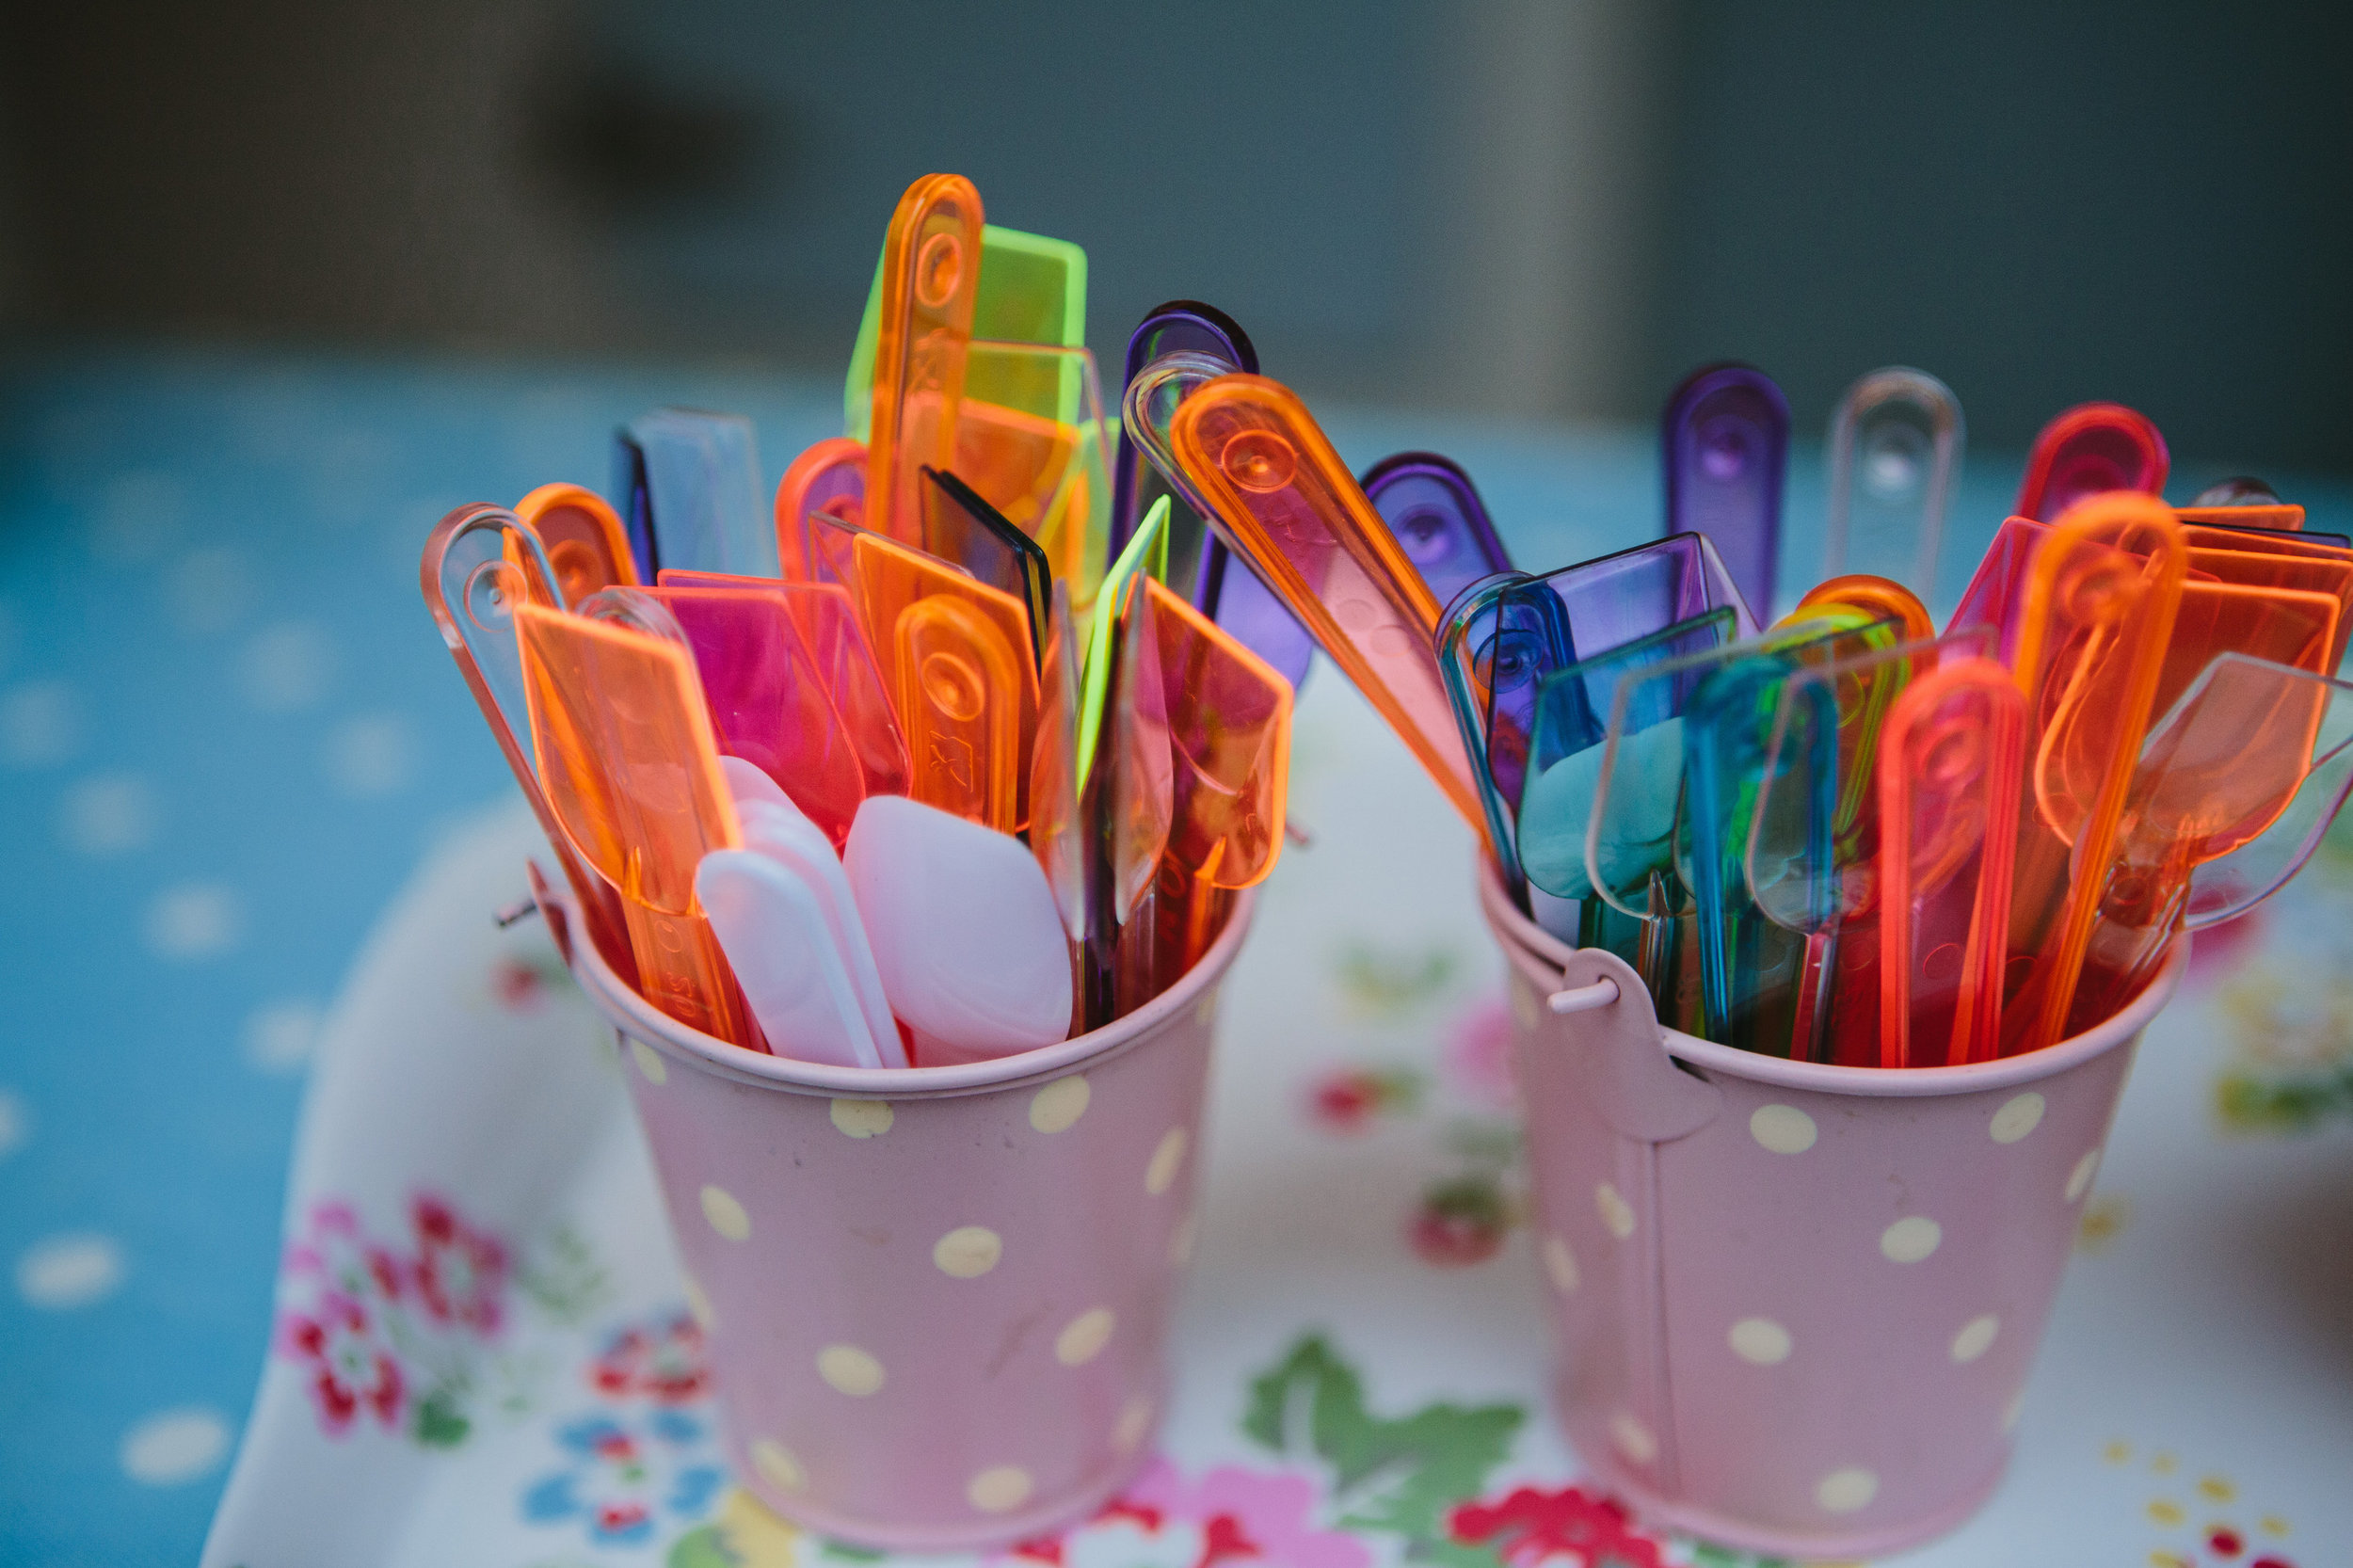 colourful-spoons.jpg